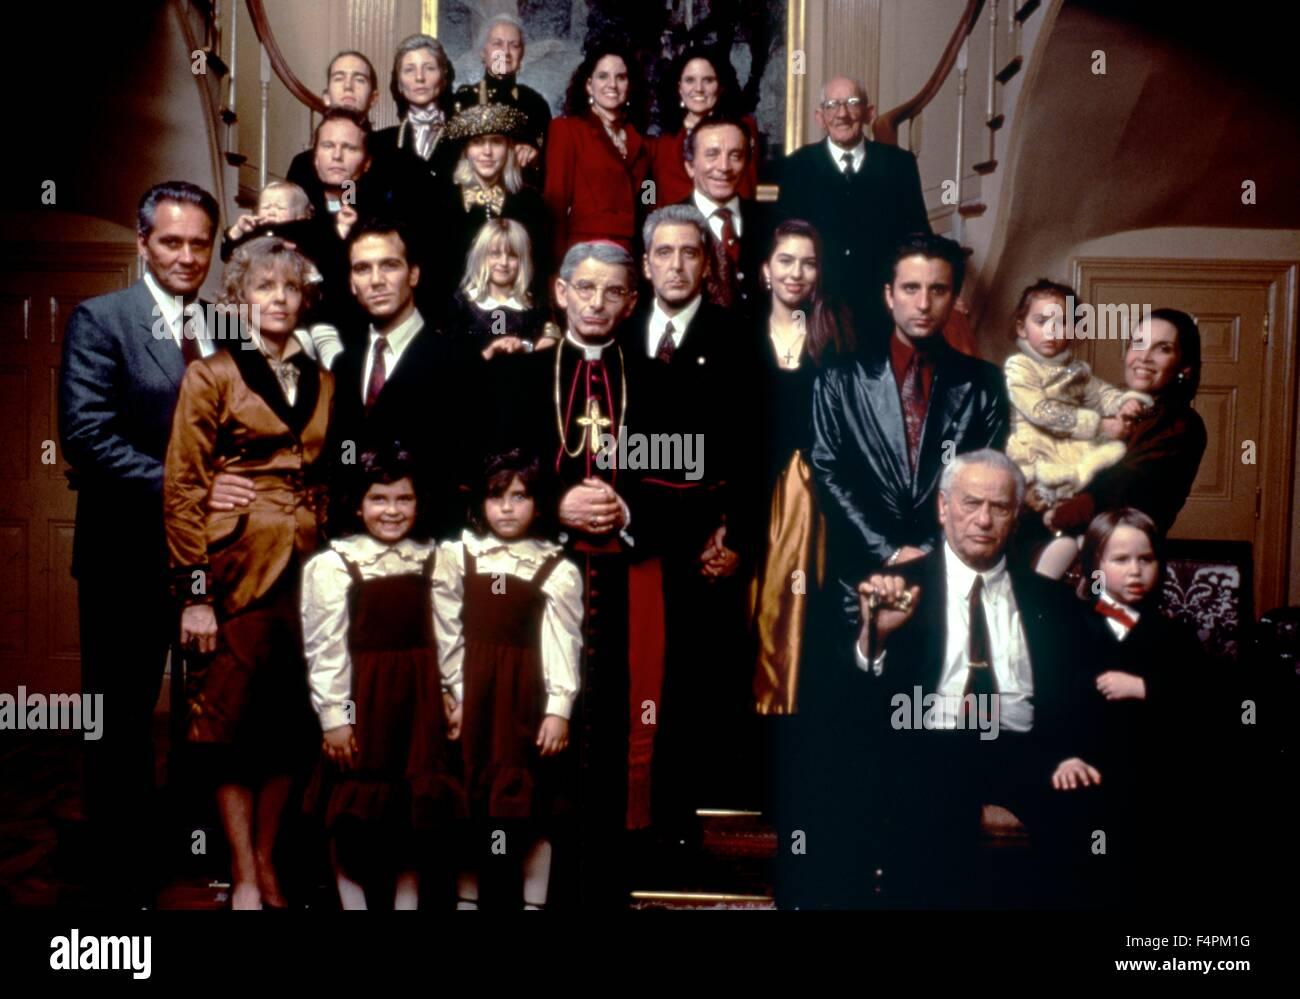 Diane Keaton, John Savage, Donald Donnelly, Al Pacino, Sofia Coppola, Andy Garcia, Eli Wallach and Talia Shire / - Stock Image